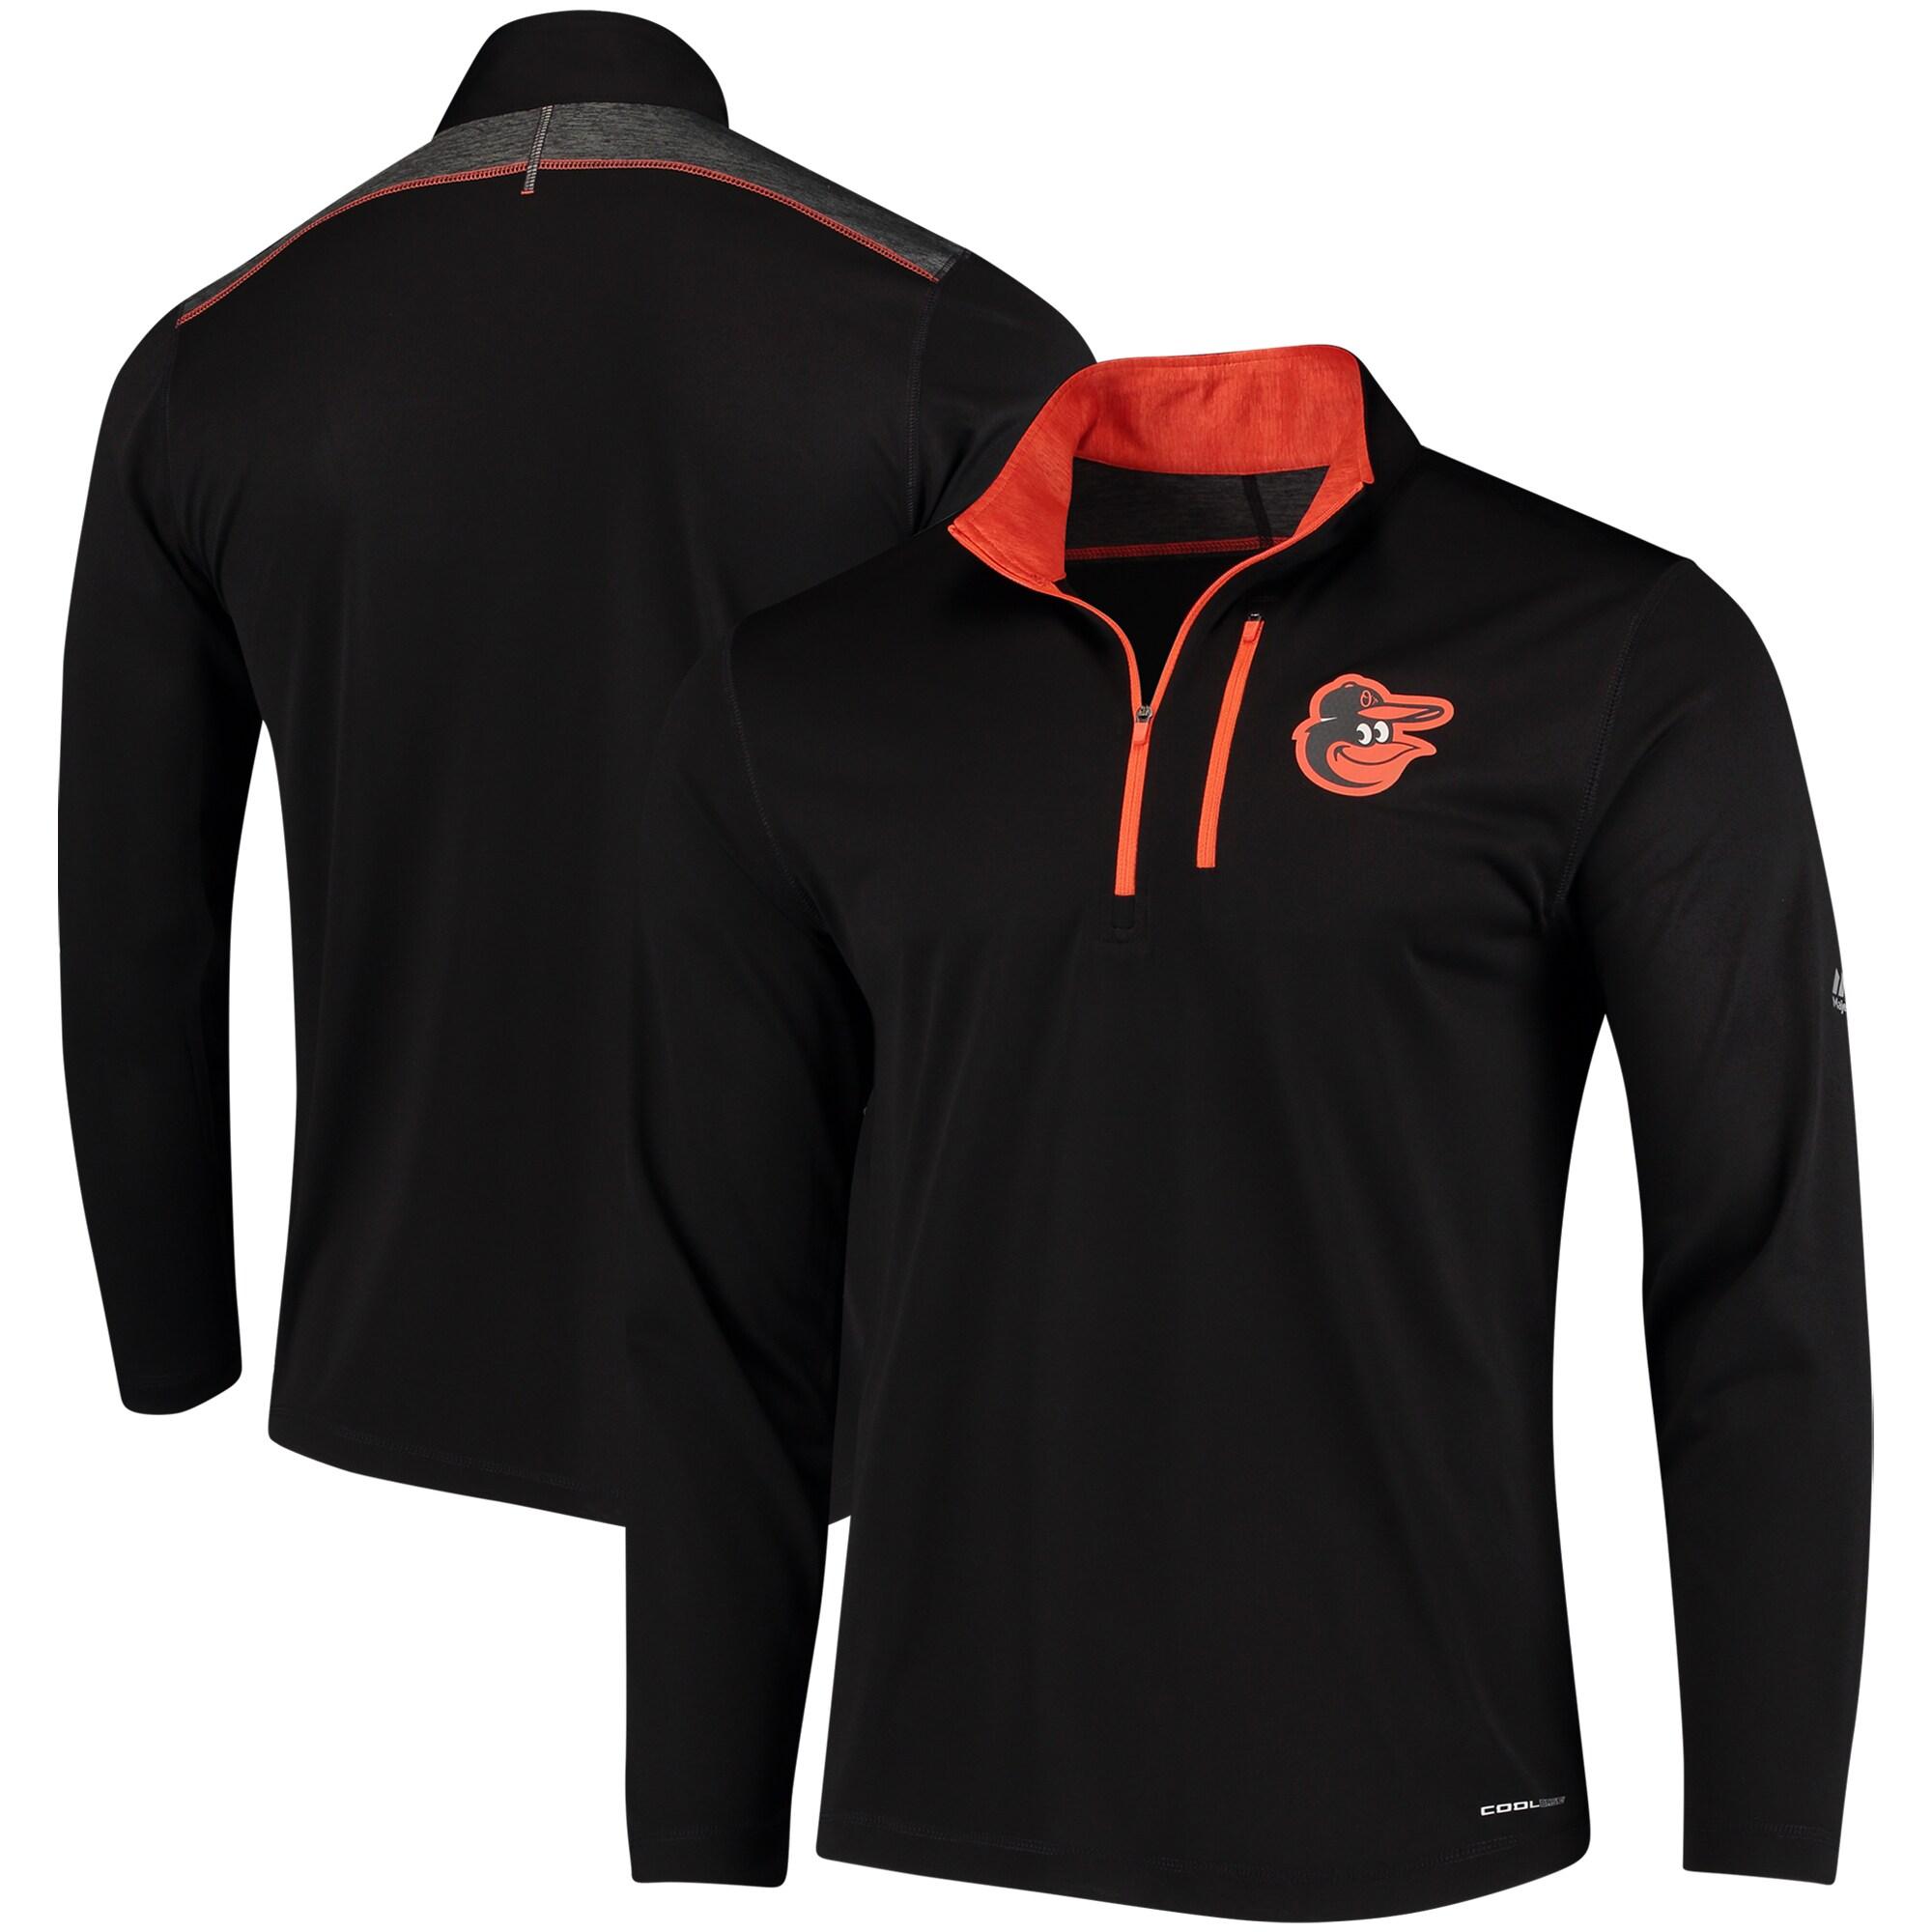 Baltimore Orioles Majestic Half-Zip Pullover Top - Black